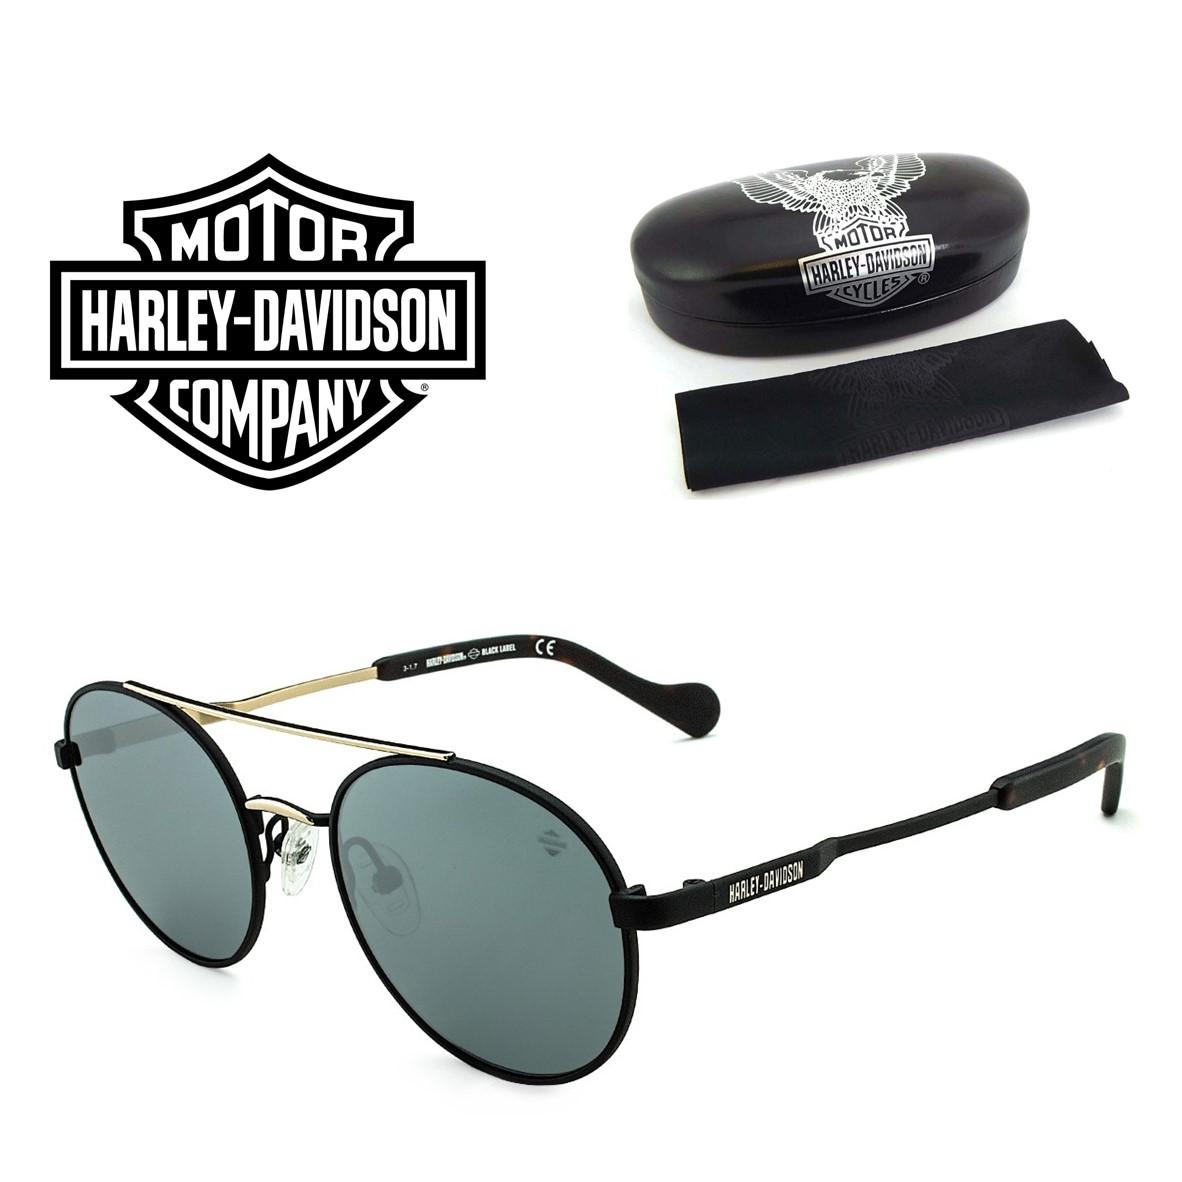 Harley De Davidson® It 02c Gafas Hd2053 Sol 53 You Like dsQhtrCx